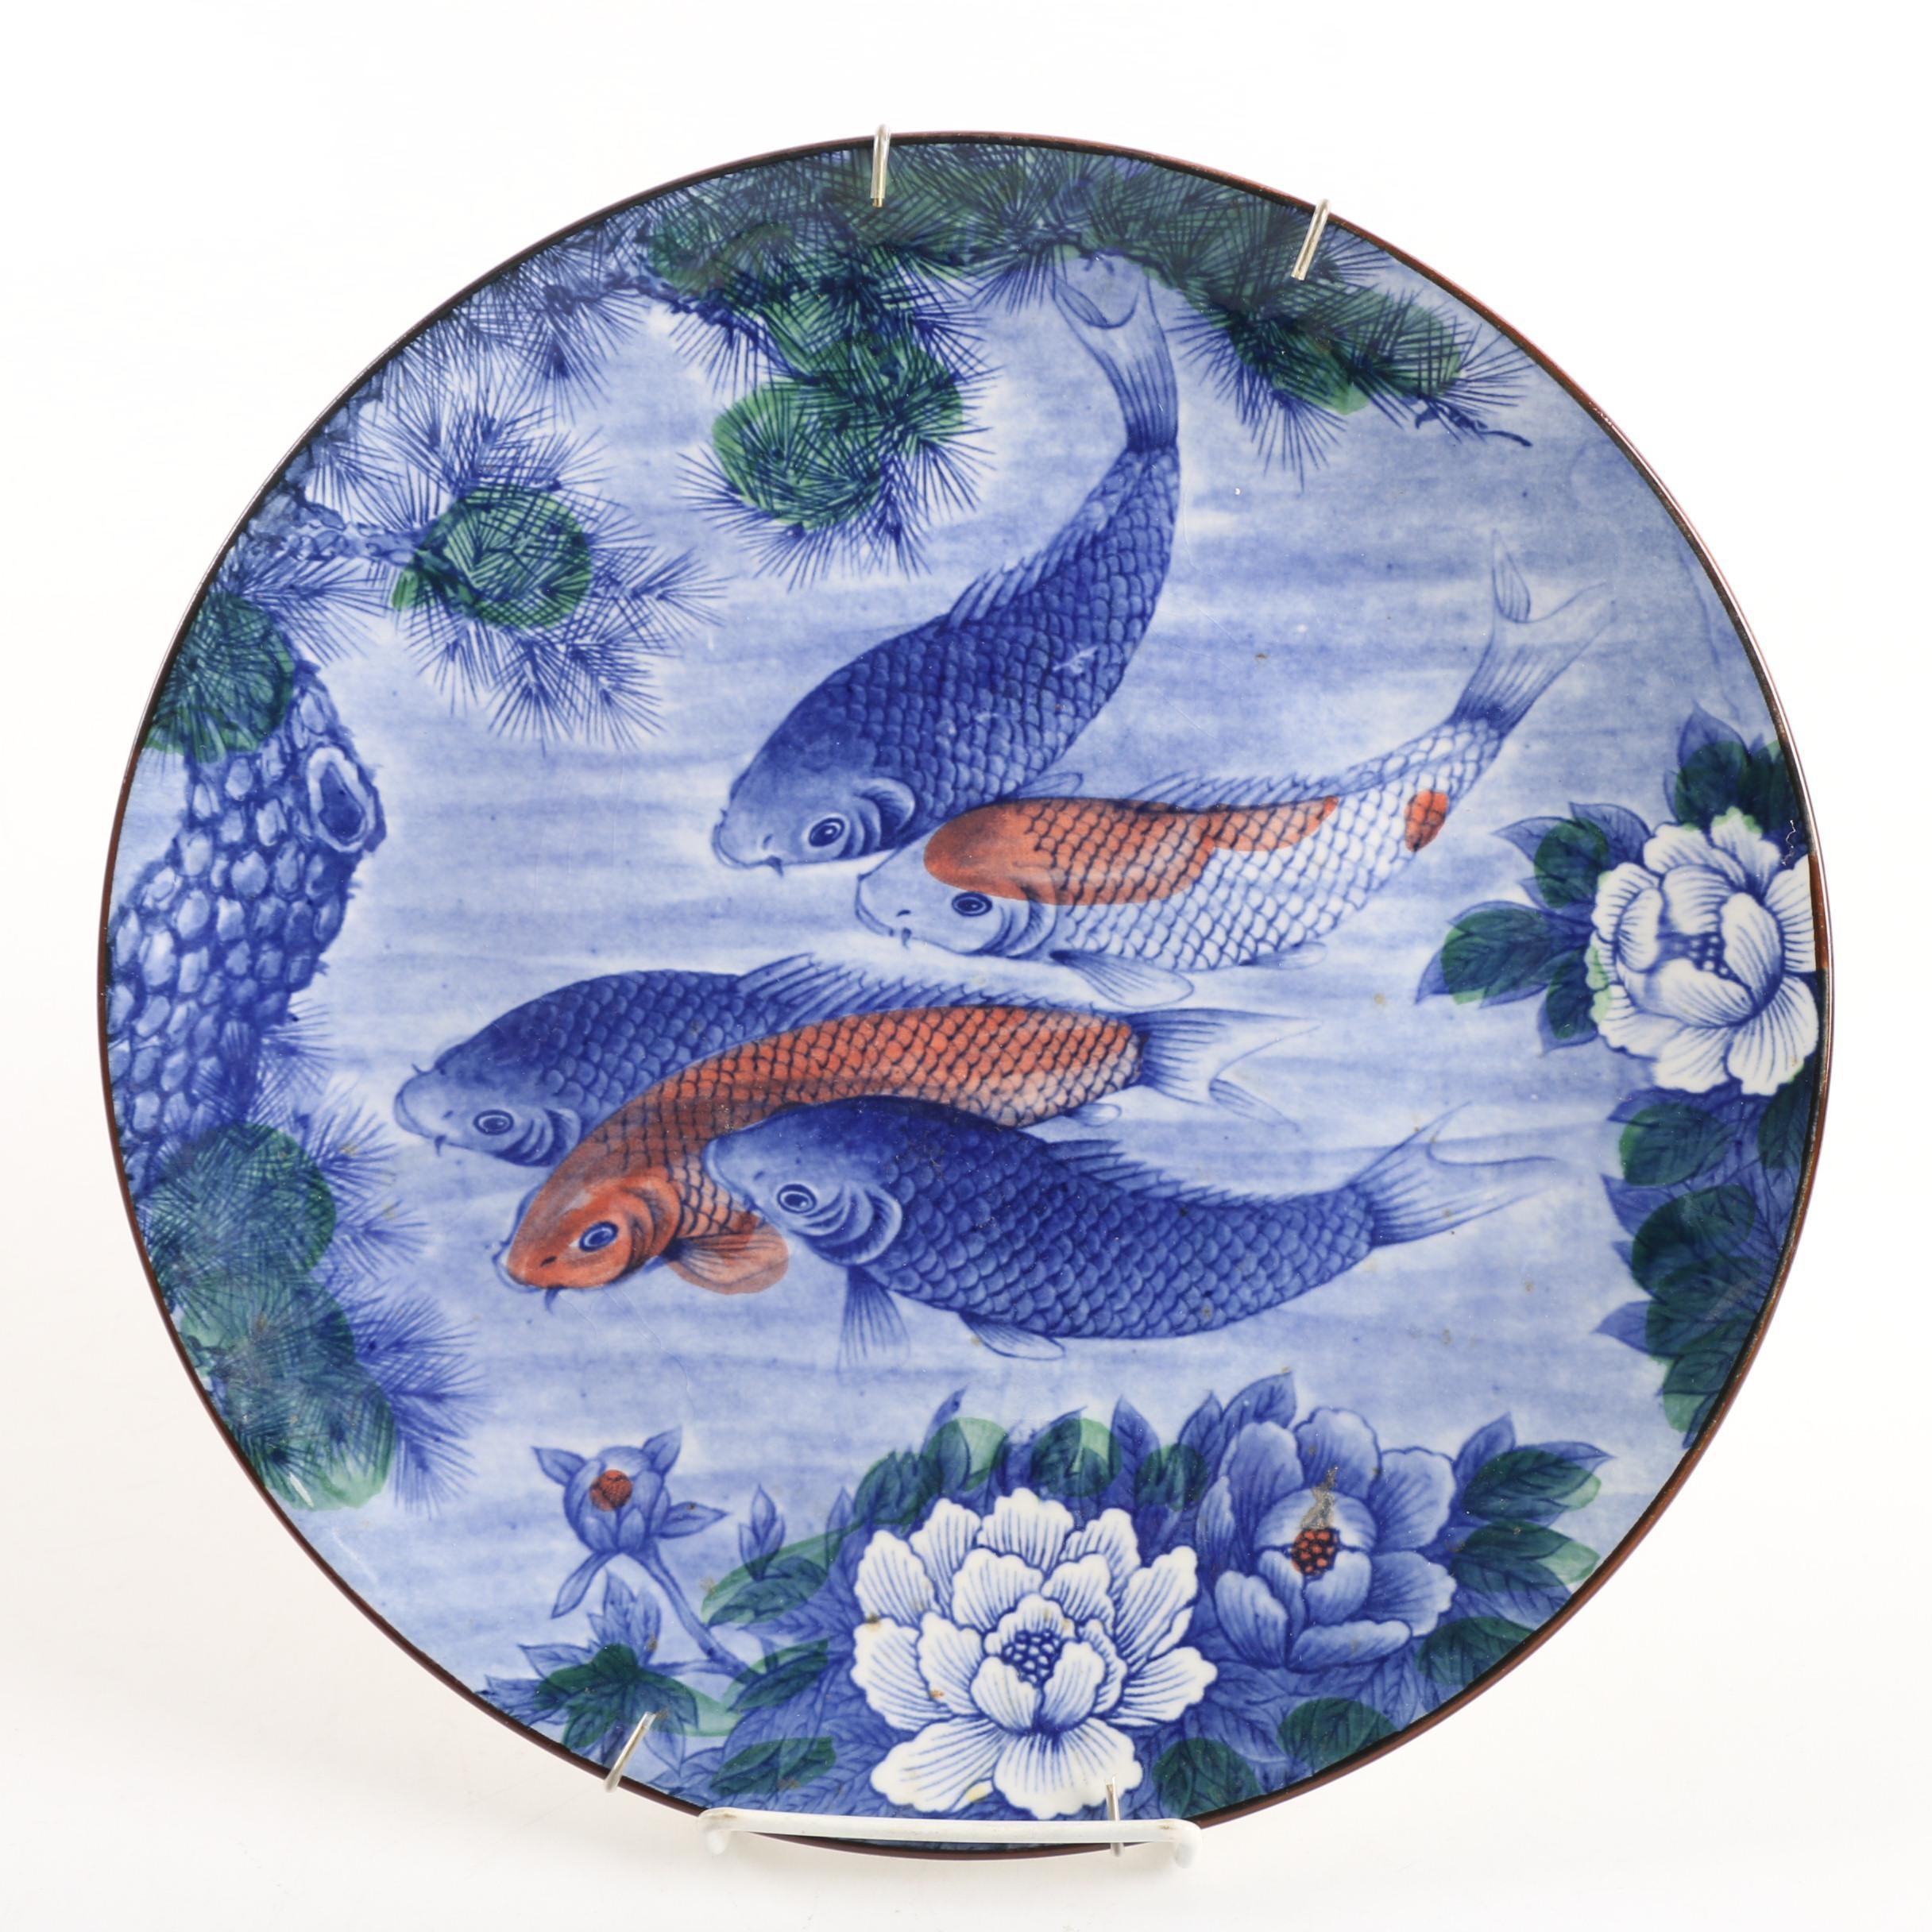 Vintage Japanese Porcelain Koi Fish in Pond Plate